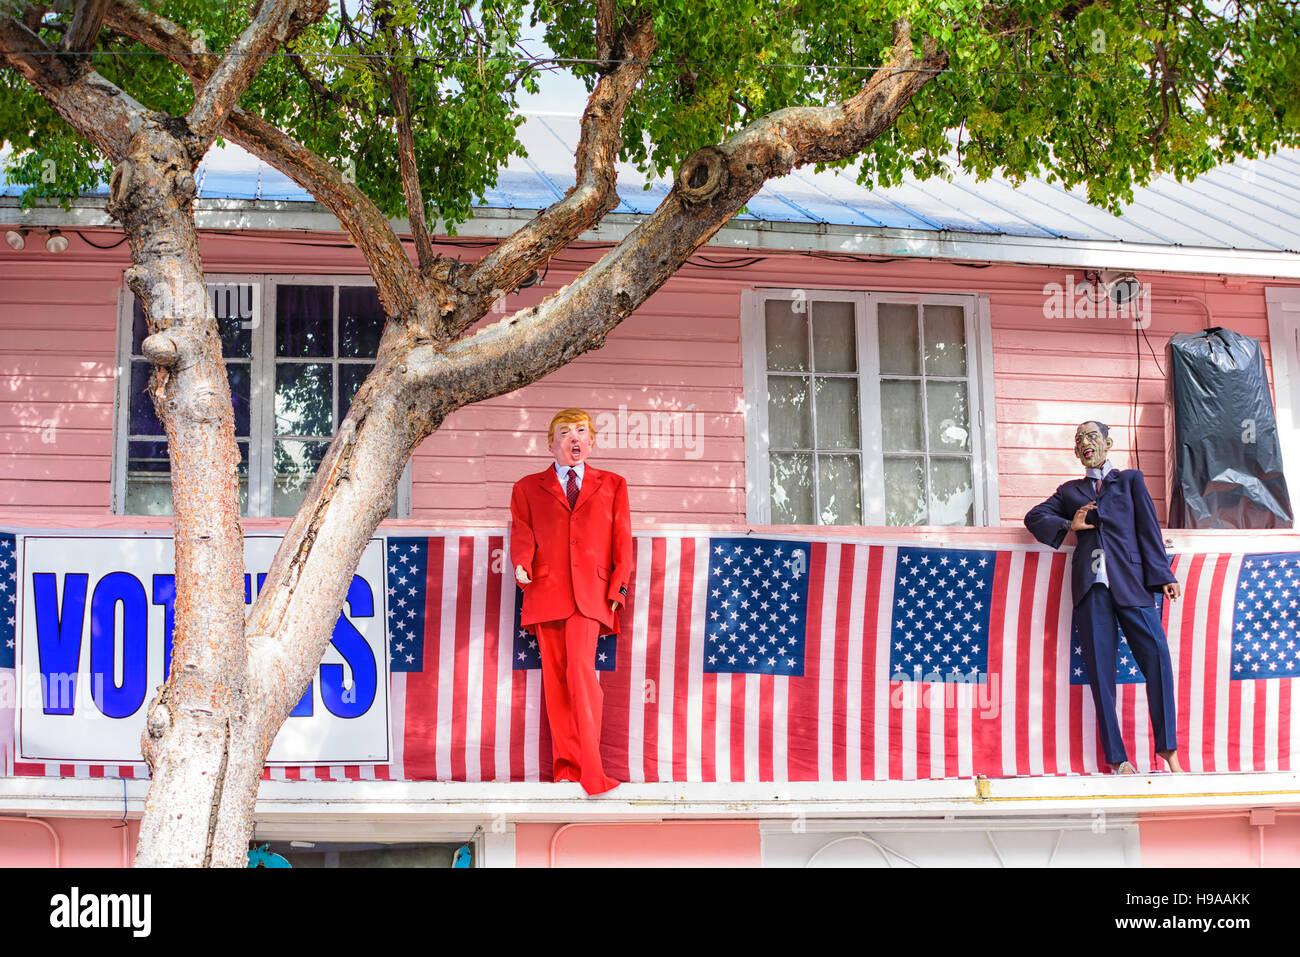 2016 Fantasy Fest decorations at 801 Bourbon Bar Key West, Florida. Theme political  voodoo & ballot box barbarians - Stock Image